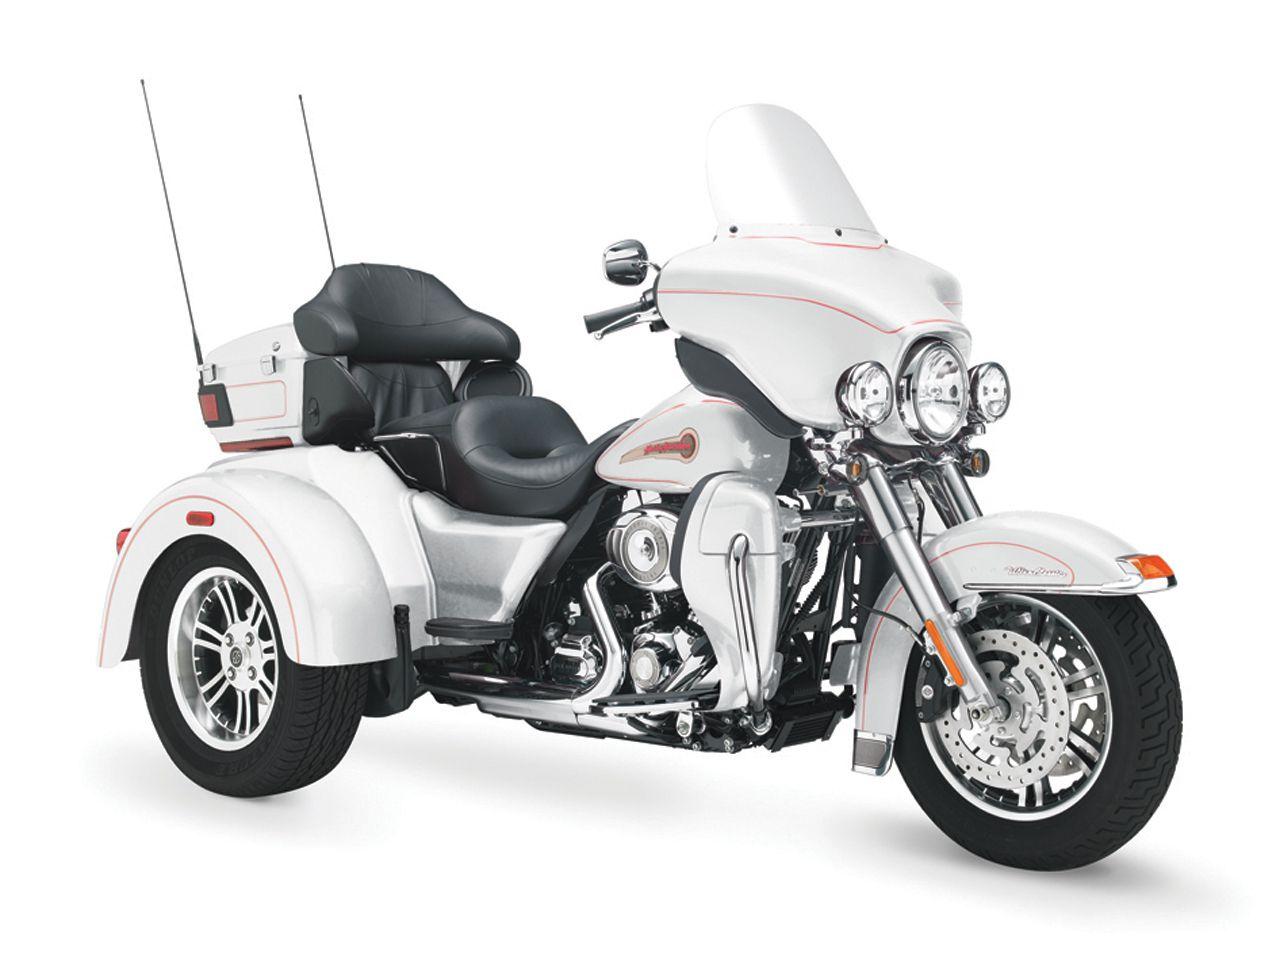 2010 Harley-Davidson Tri Glide Shriner's